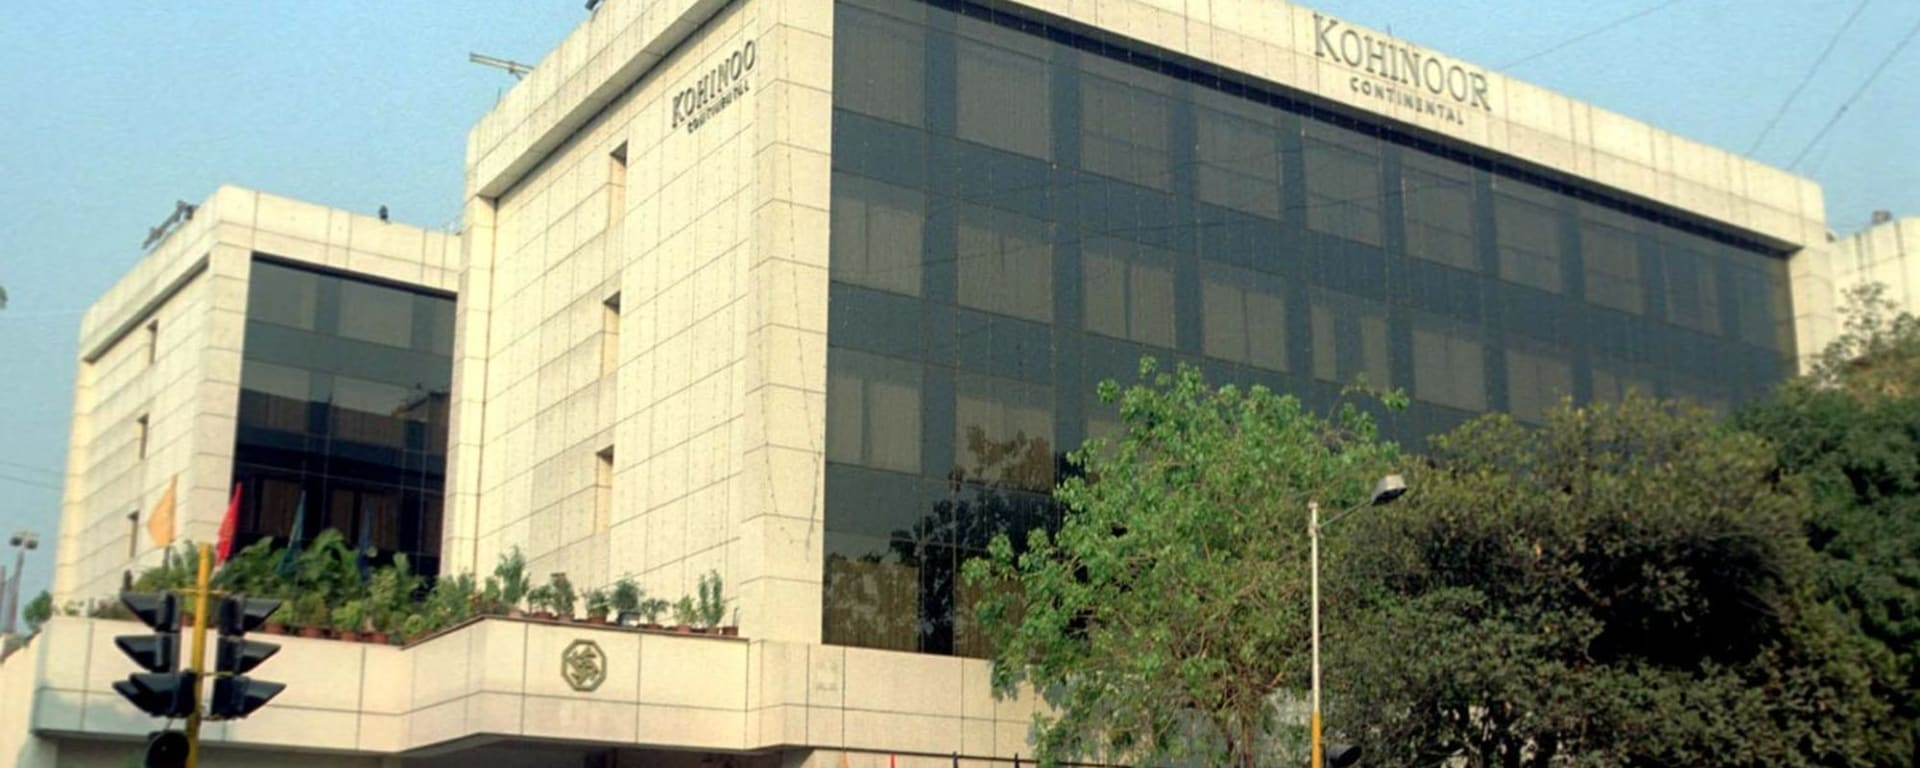 Kohinoor Continental in Mumbai: